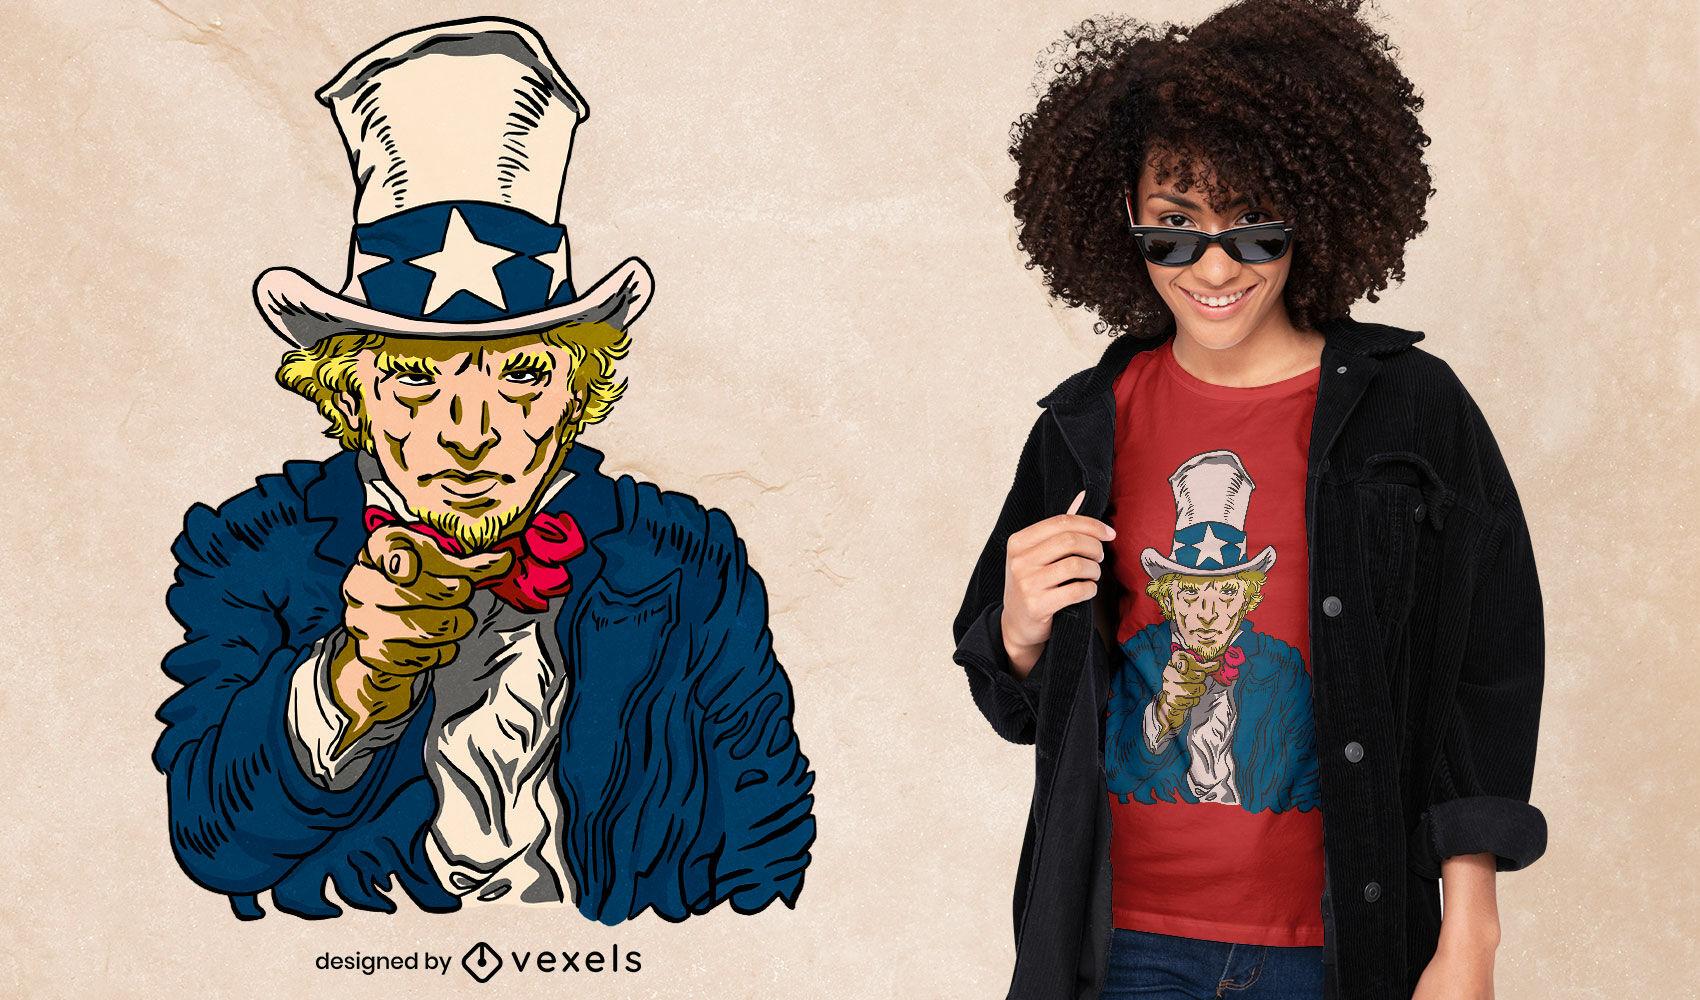 Uncle Sam amerikanisches Charakter-T-Shirt-Design